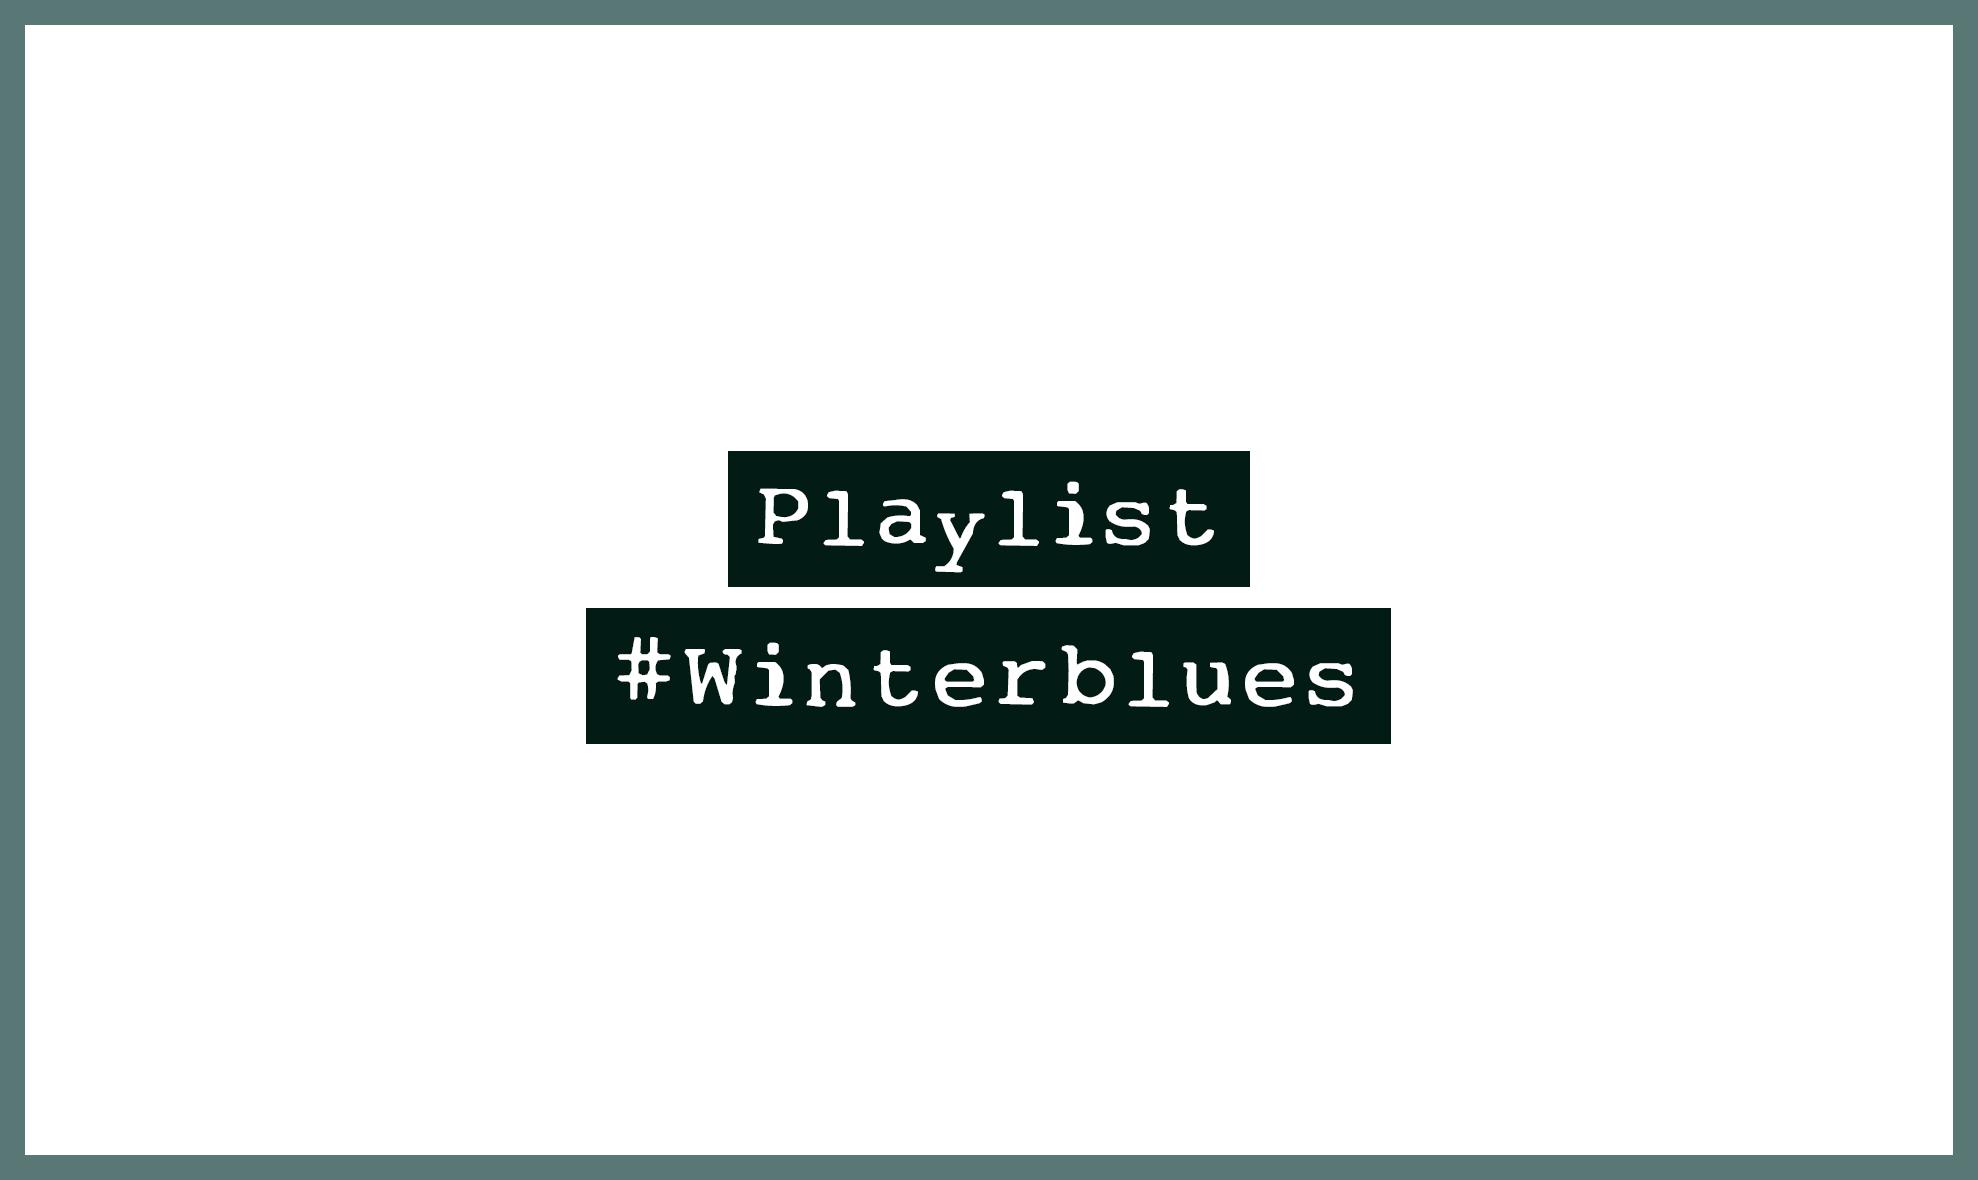 Playlist #Winterblues